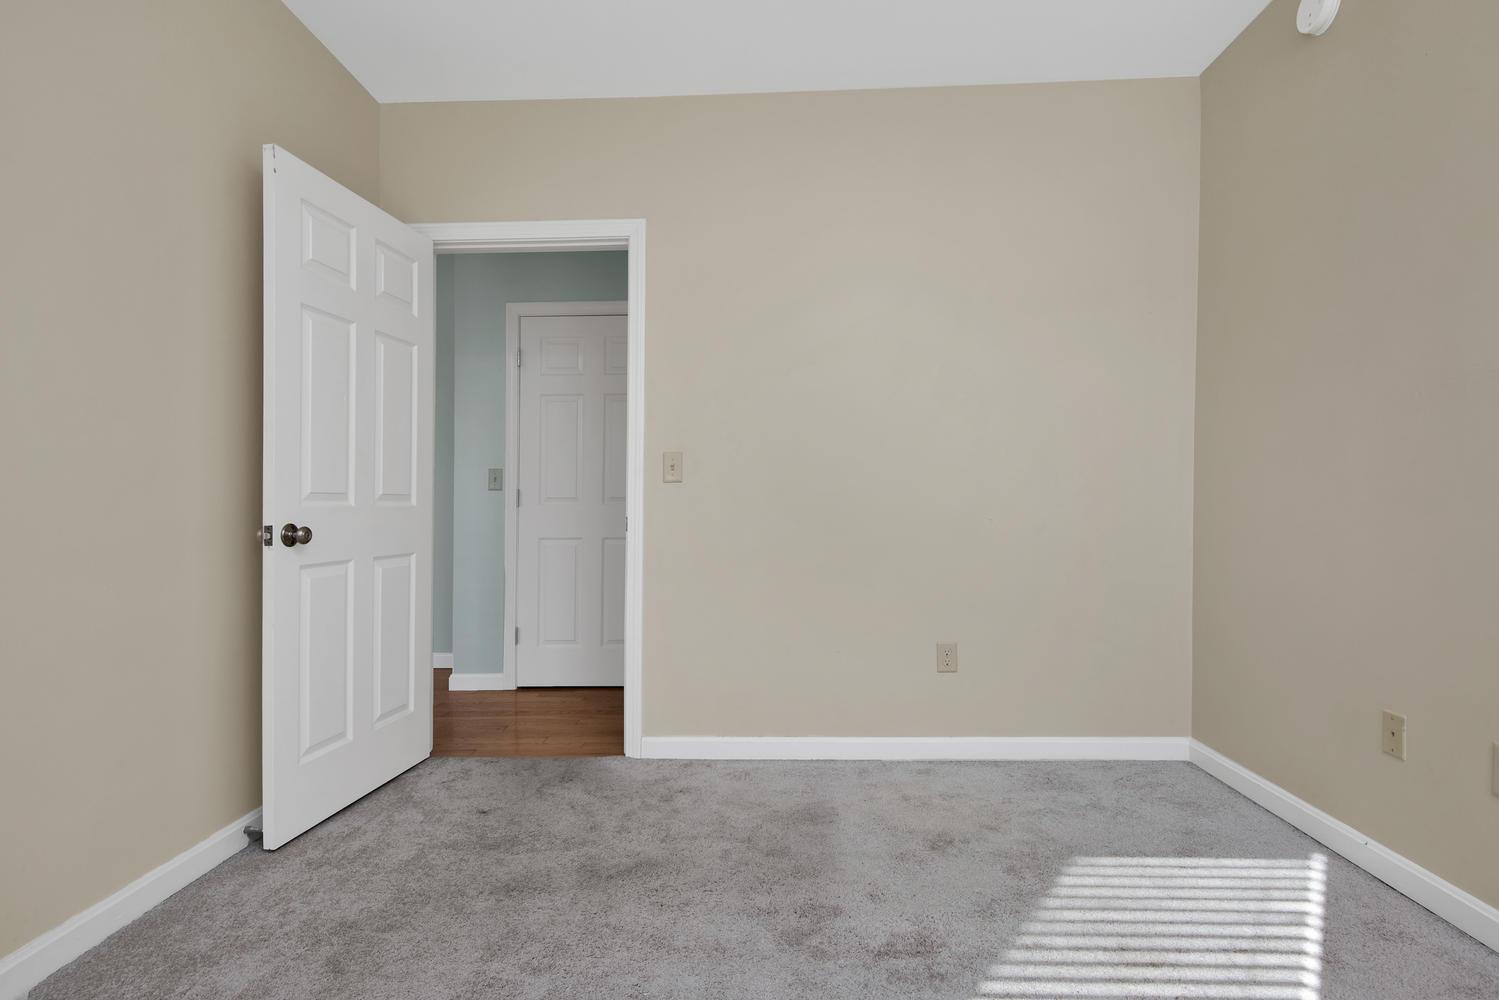 65 Sherman St Unit 12 Portland-large-015-14-Bedroom 1-1499x1000-72dpi.jpg